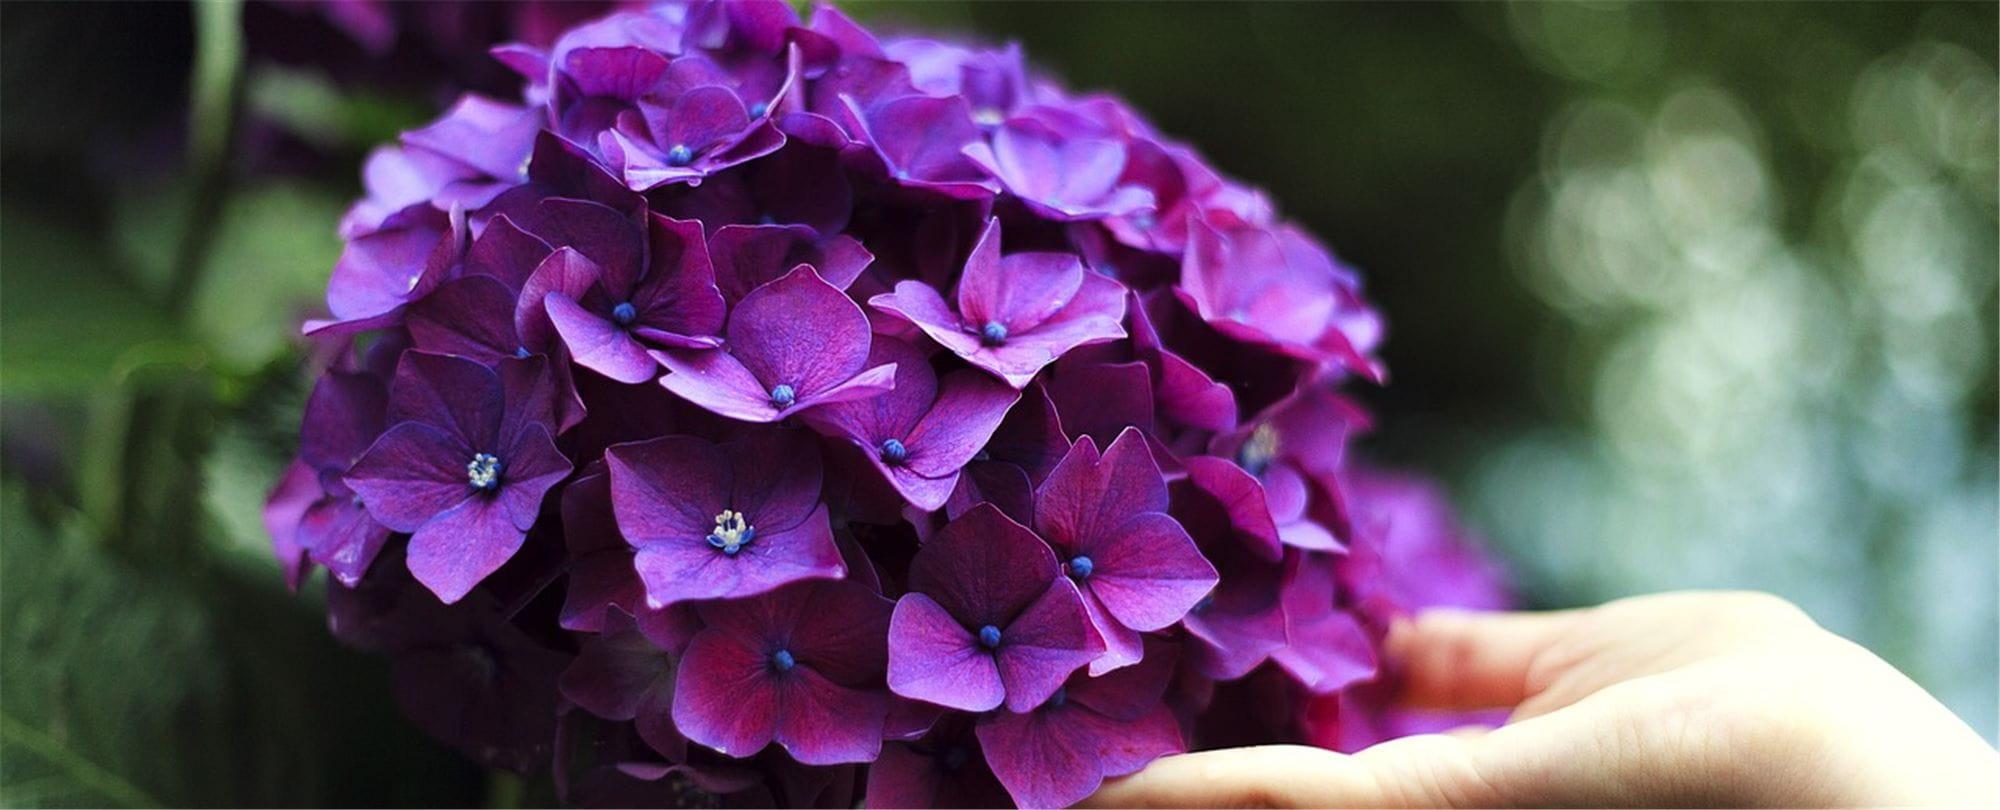 Plante A Planter En Septembre la plante du mois de septembre : l'hortensia - gardena